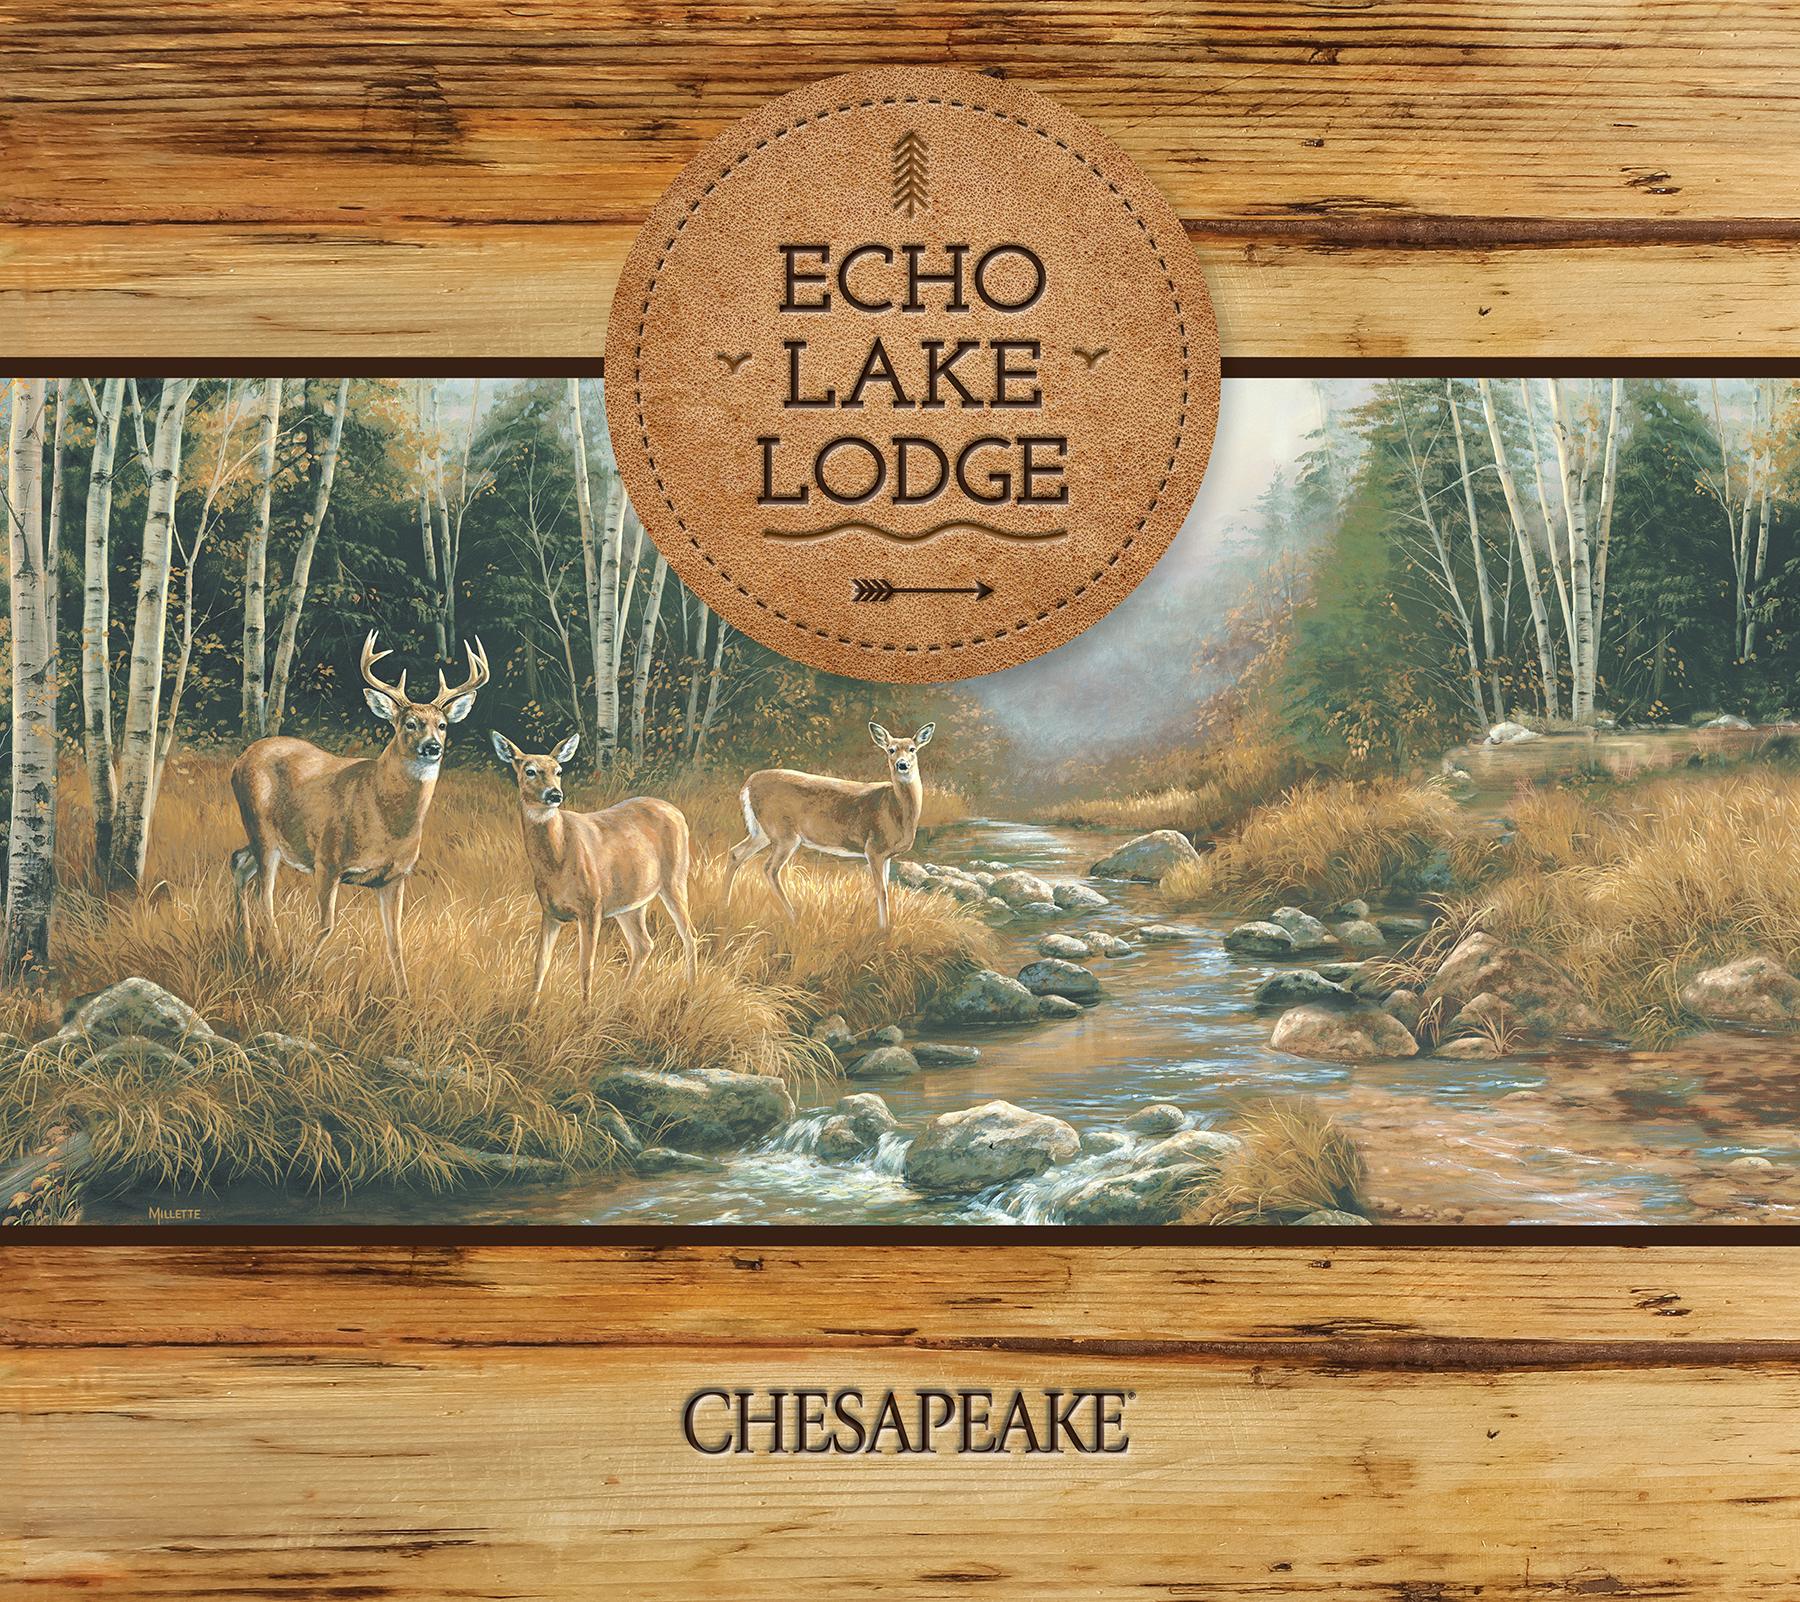 Chesapeake by Brewster TLL01353 Echo Lake Lodge Brimstone Brown Forest Leaf Toss